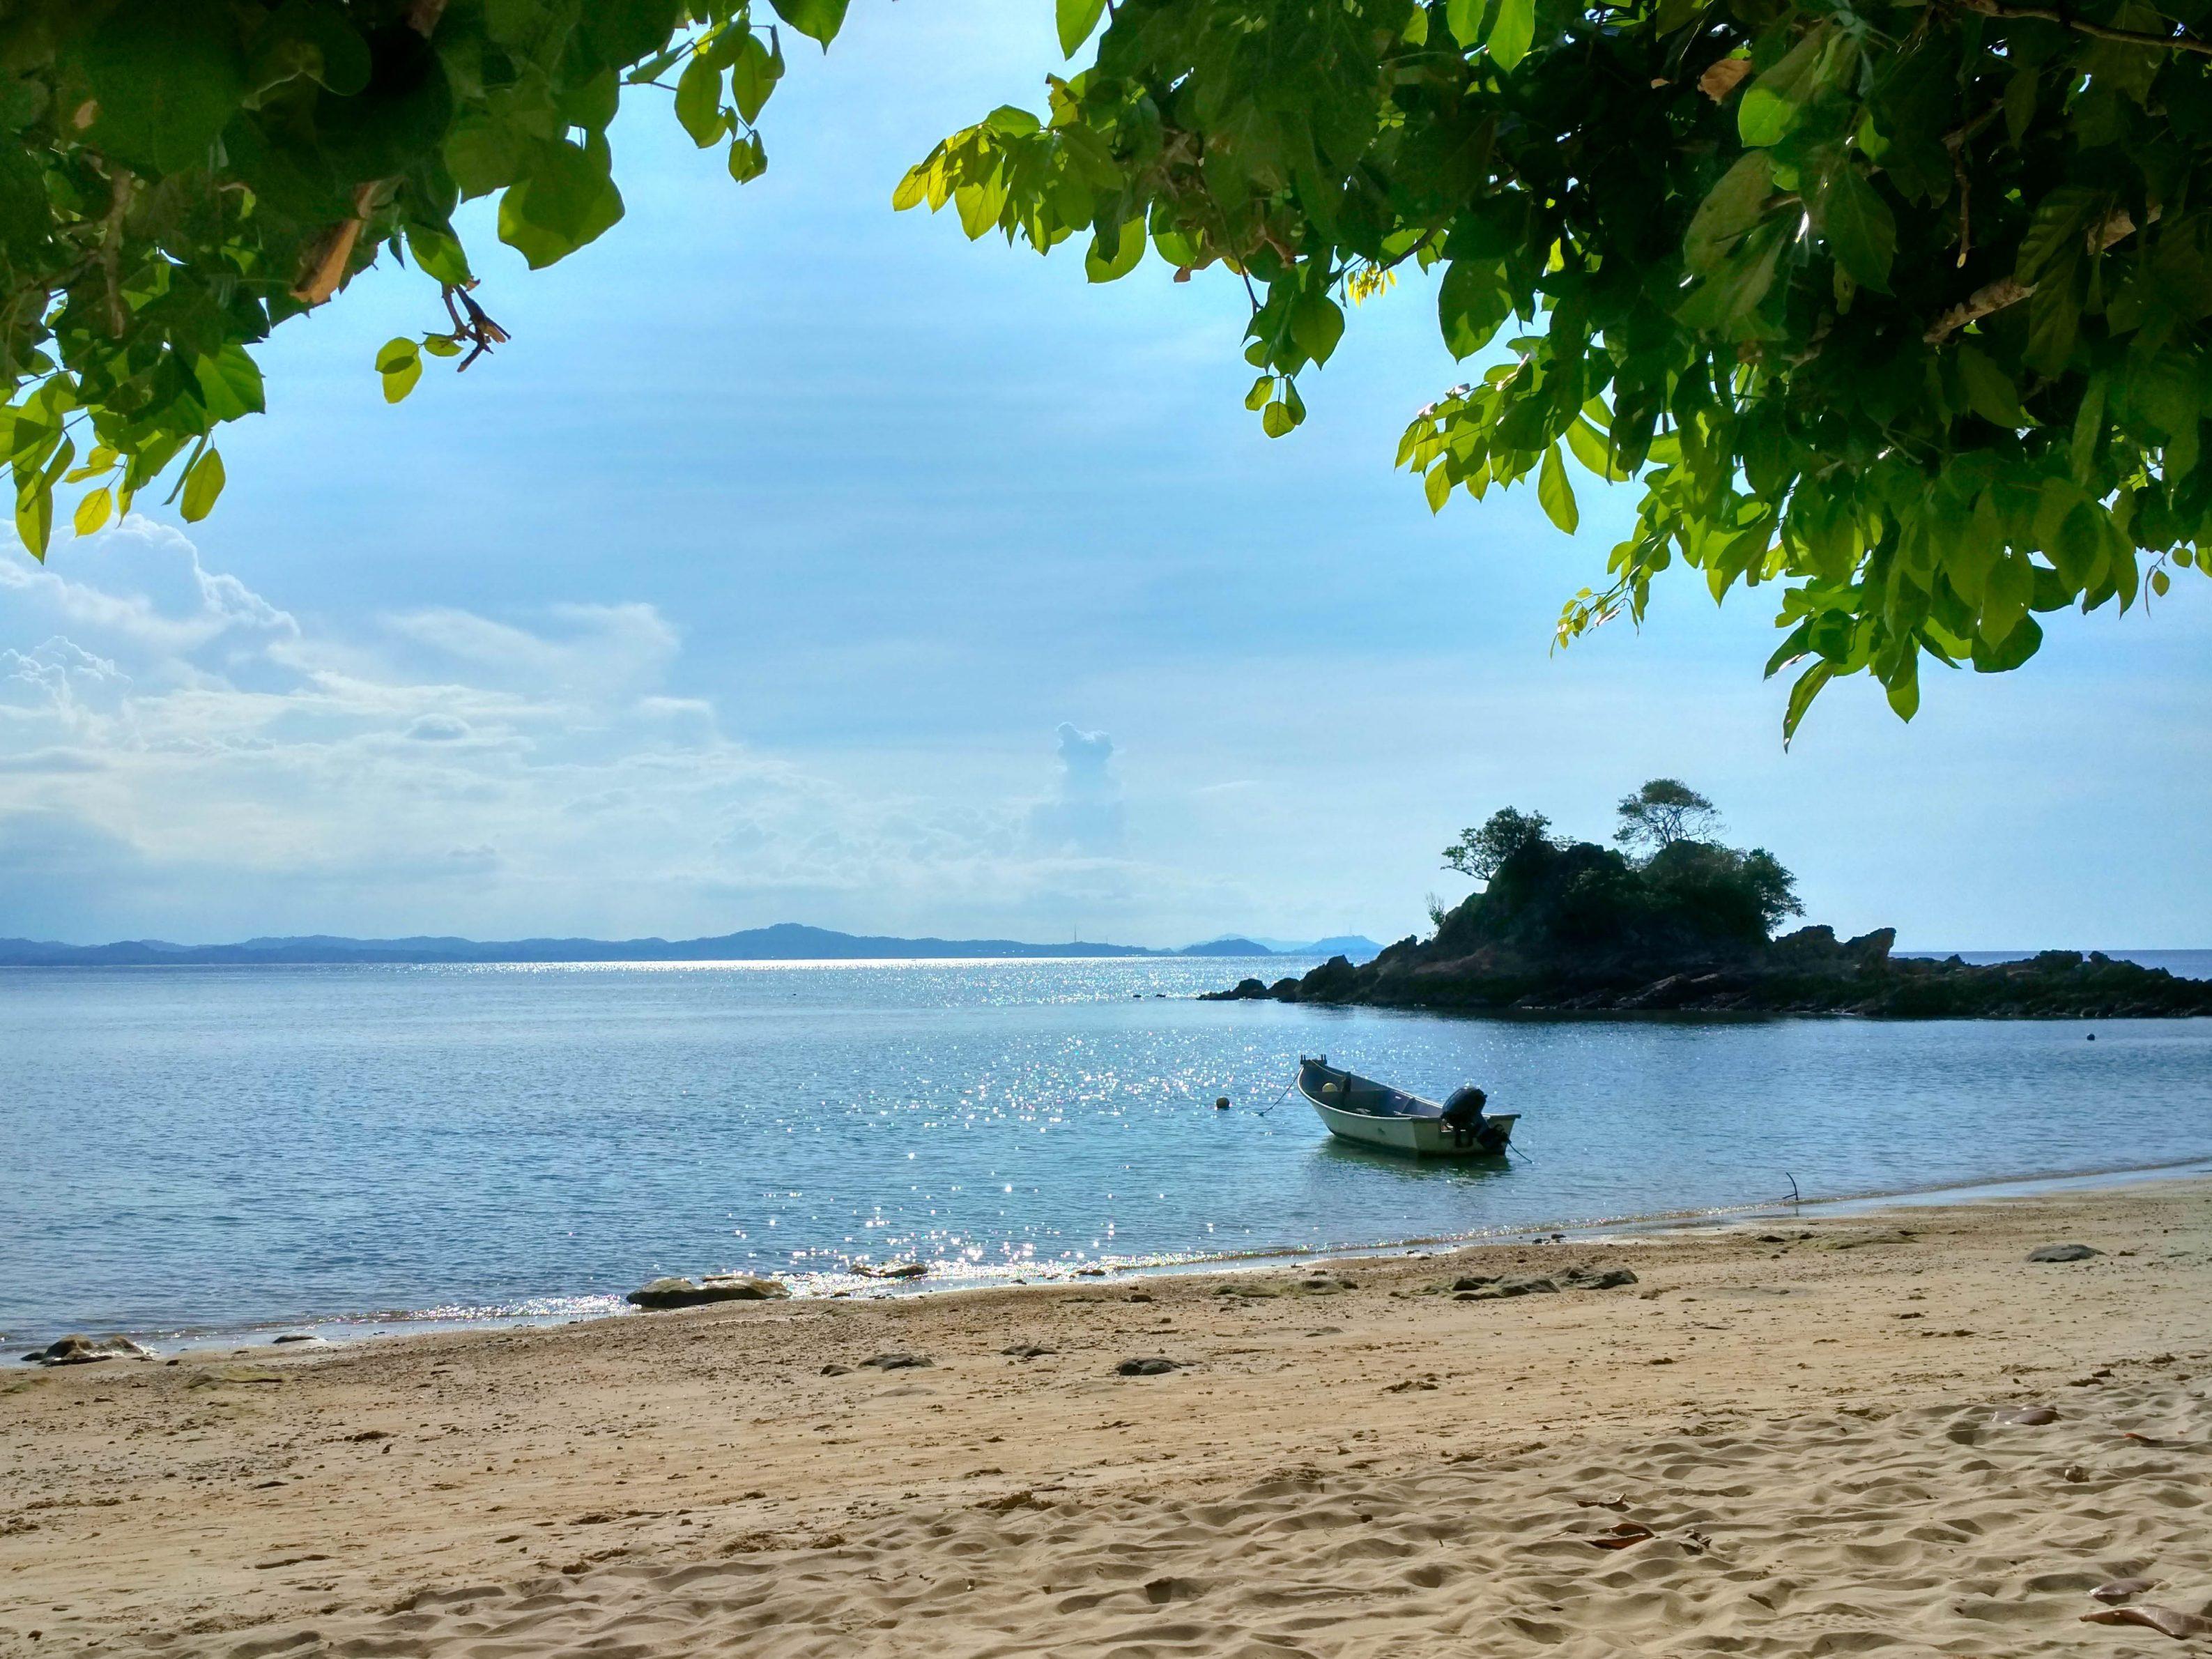 Pulau_Kapas_Aquidepaso.com